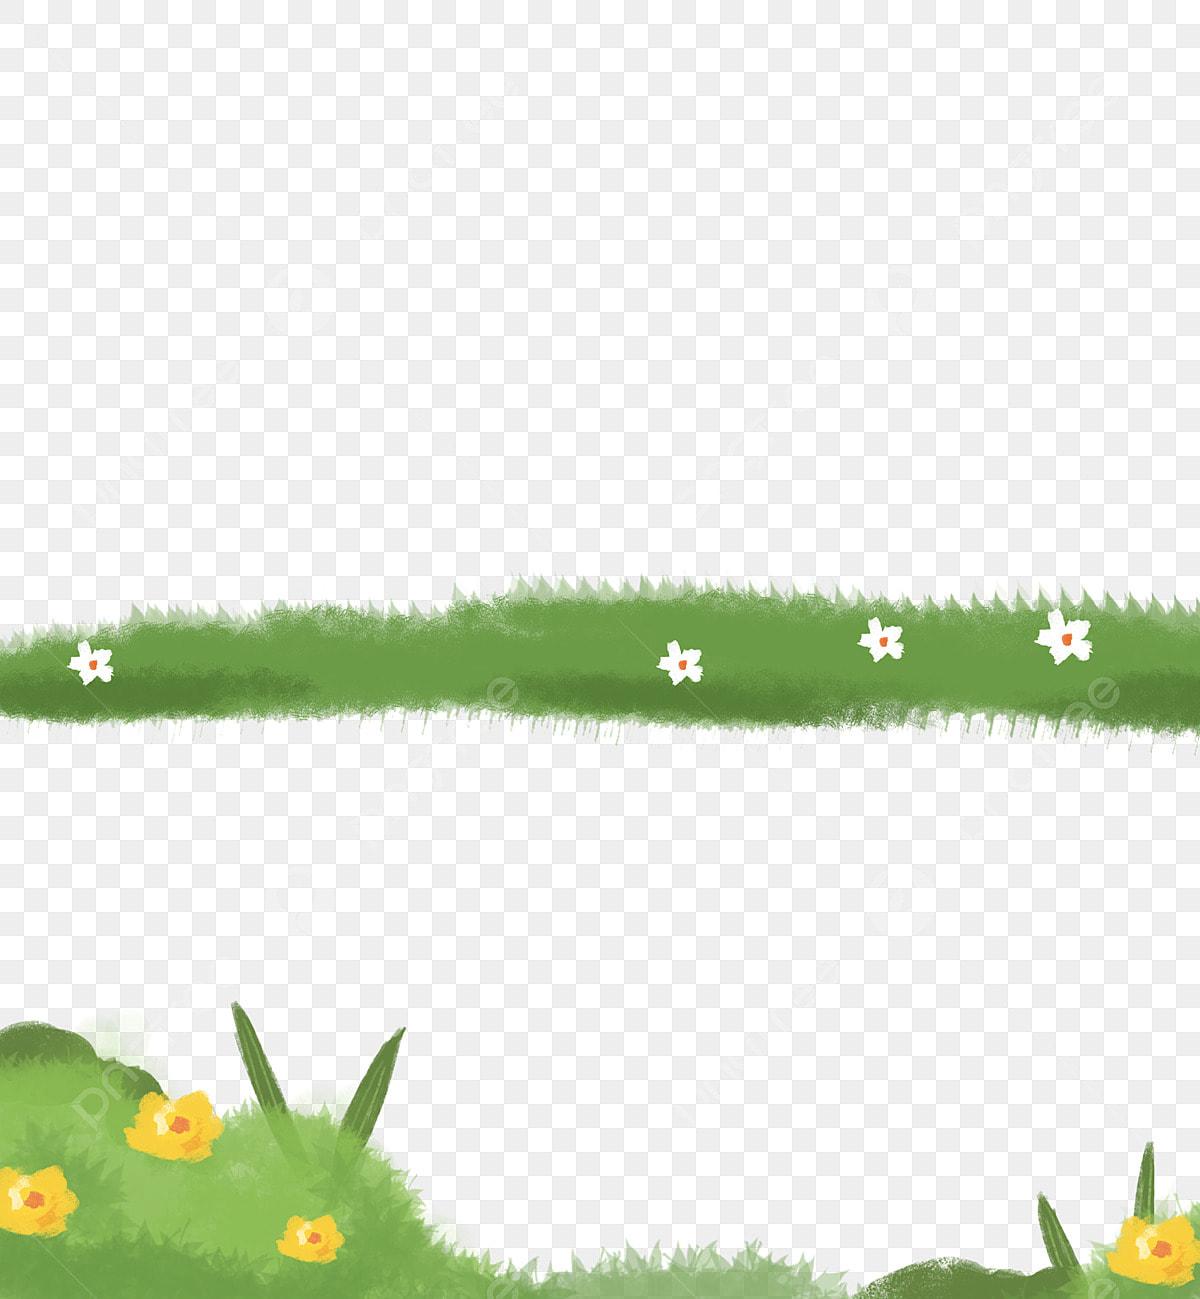 Fiori Bianchi Sottobosco.Sottobosco Pianta Verde Impianto Erba Dipinta A Mano Fiori